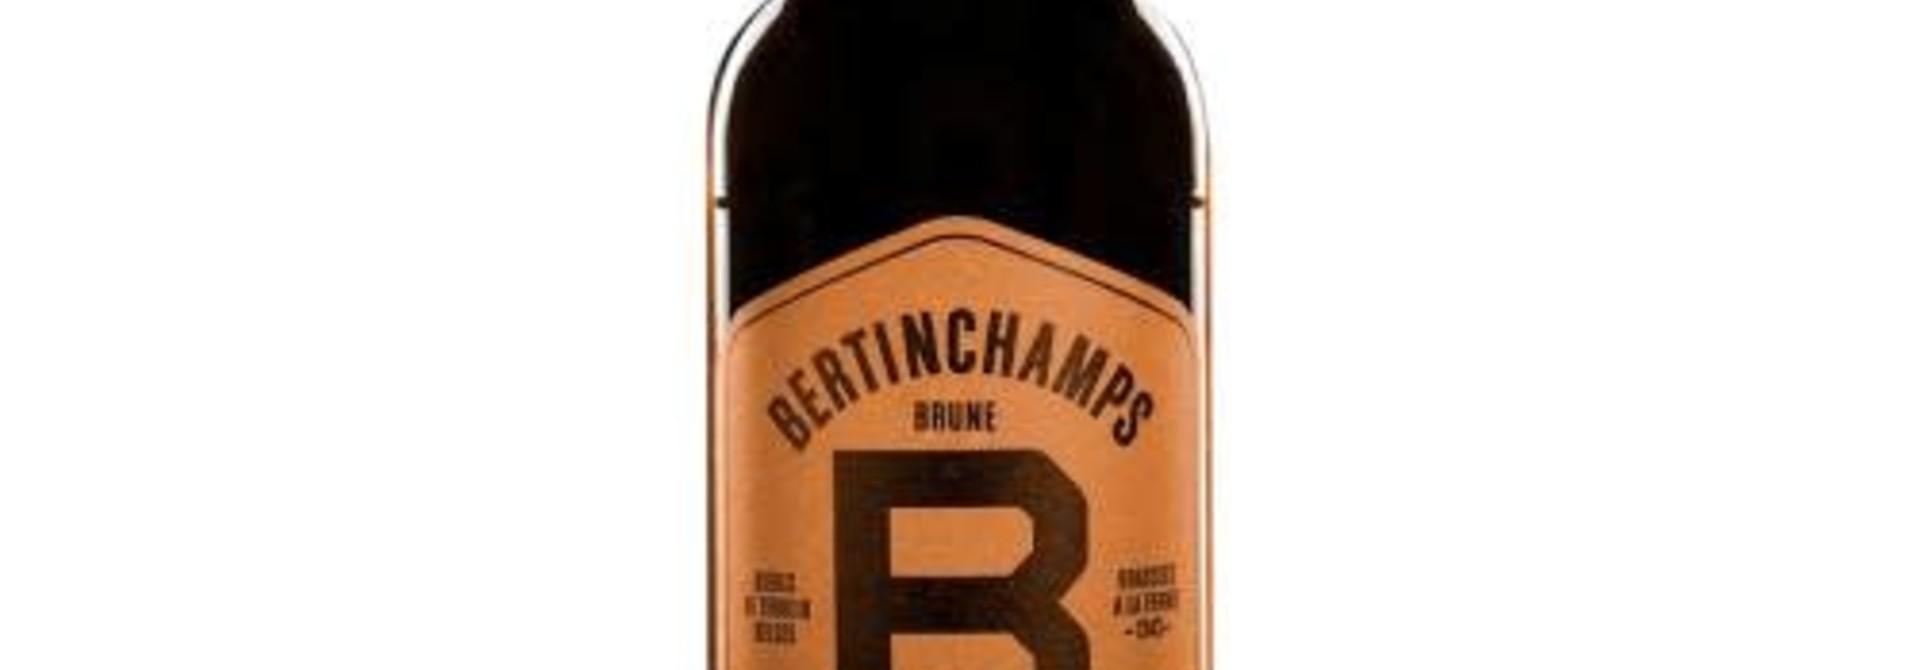 BERTINCHAMPS BRUNE 50CL